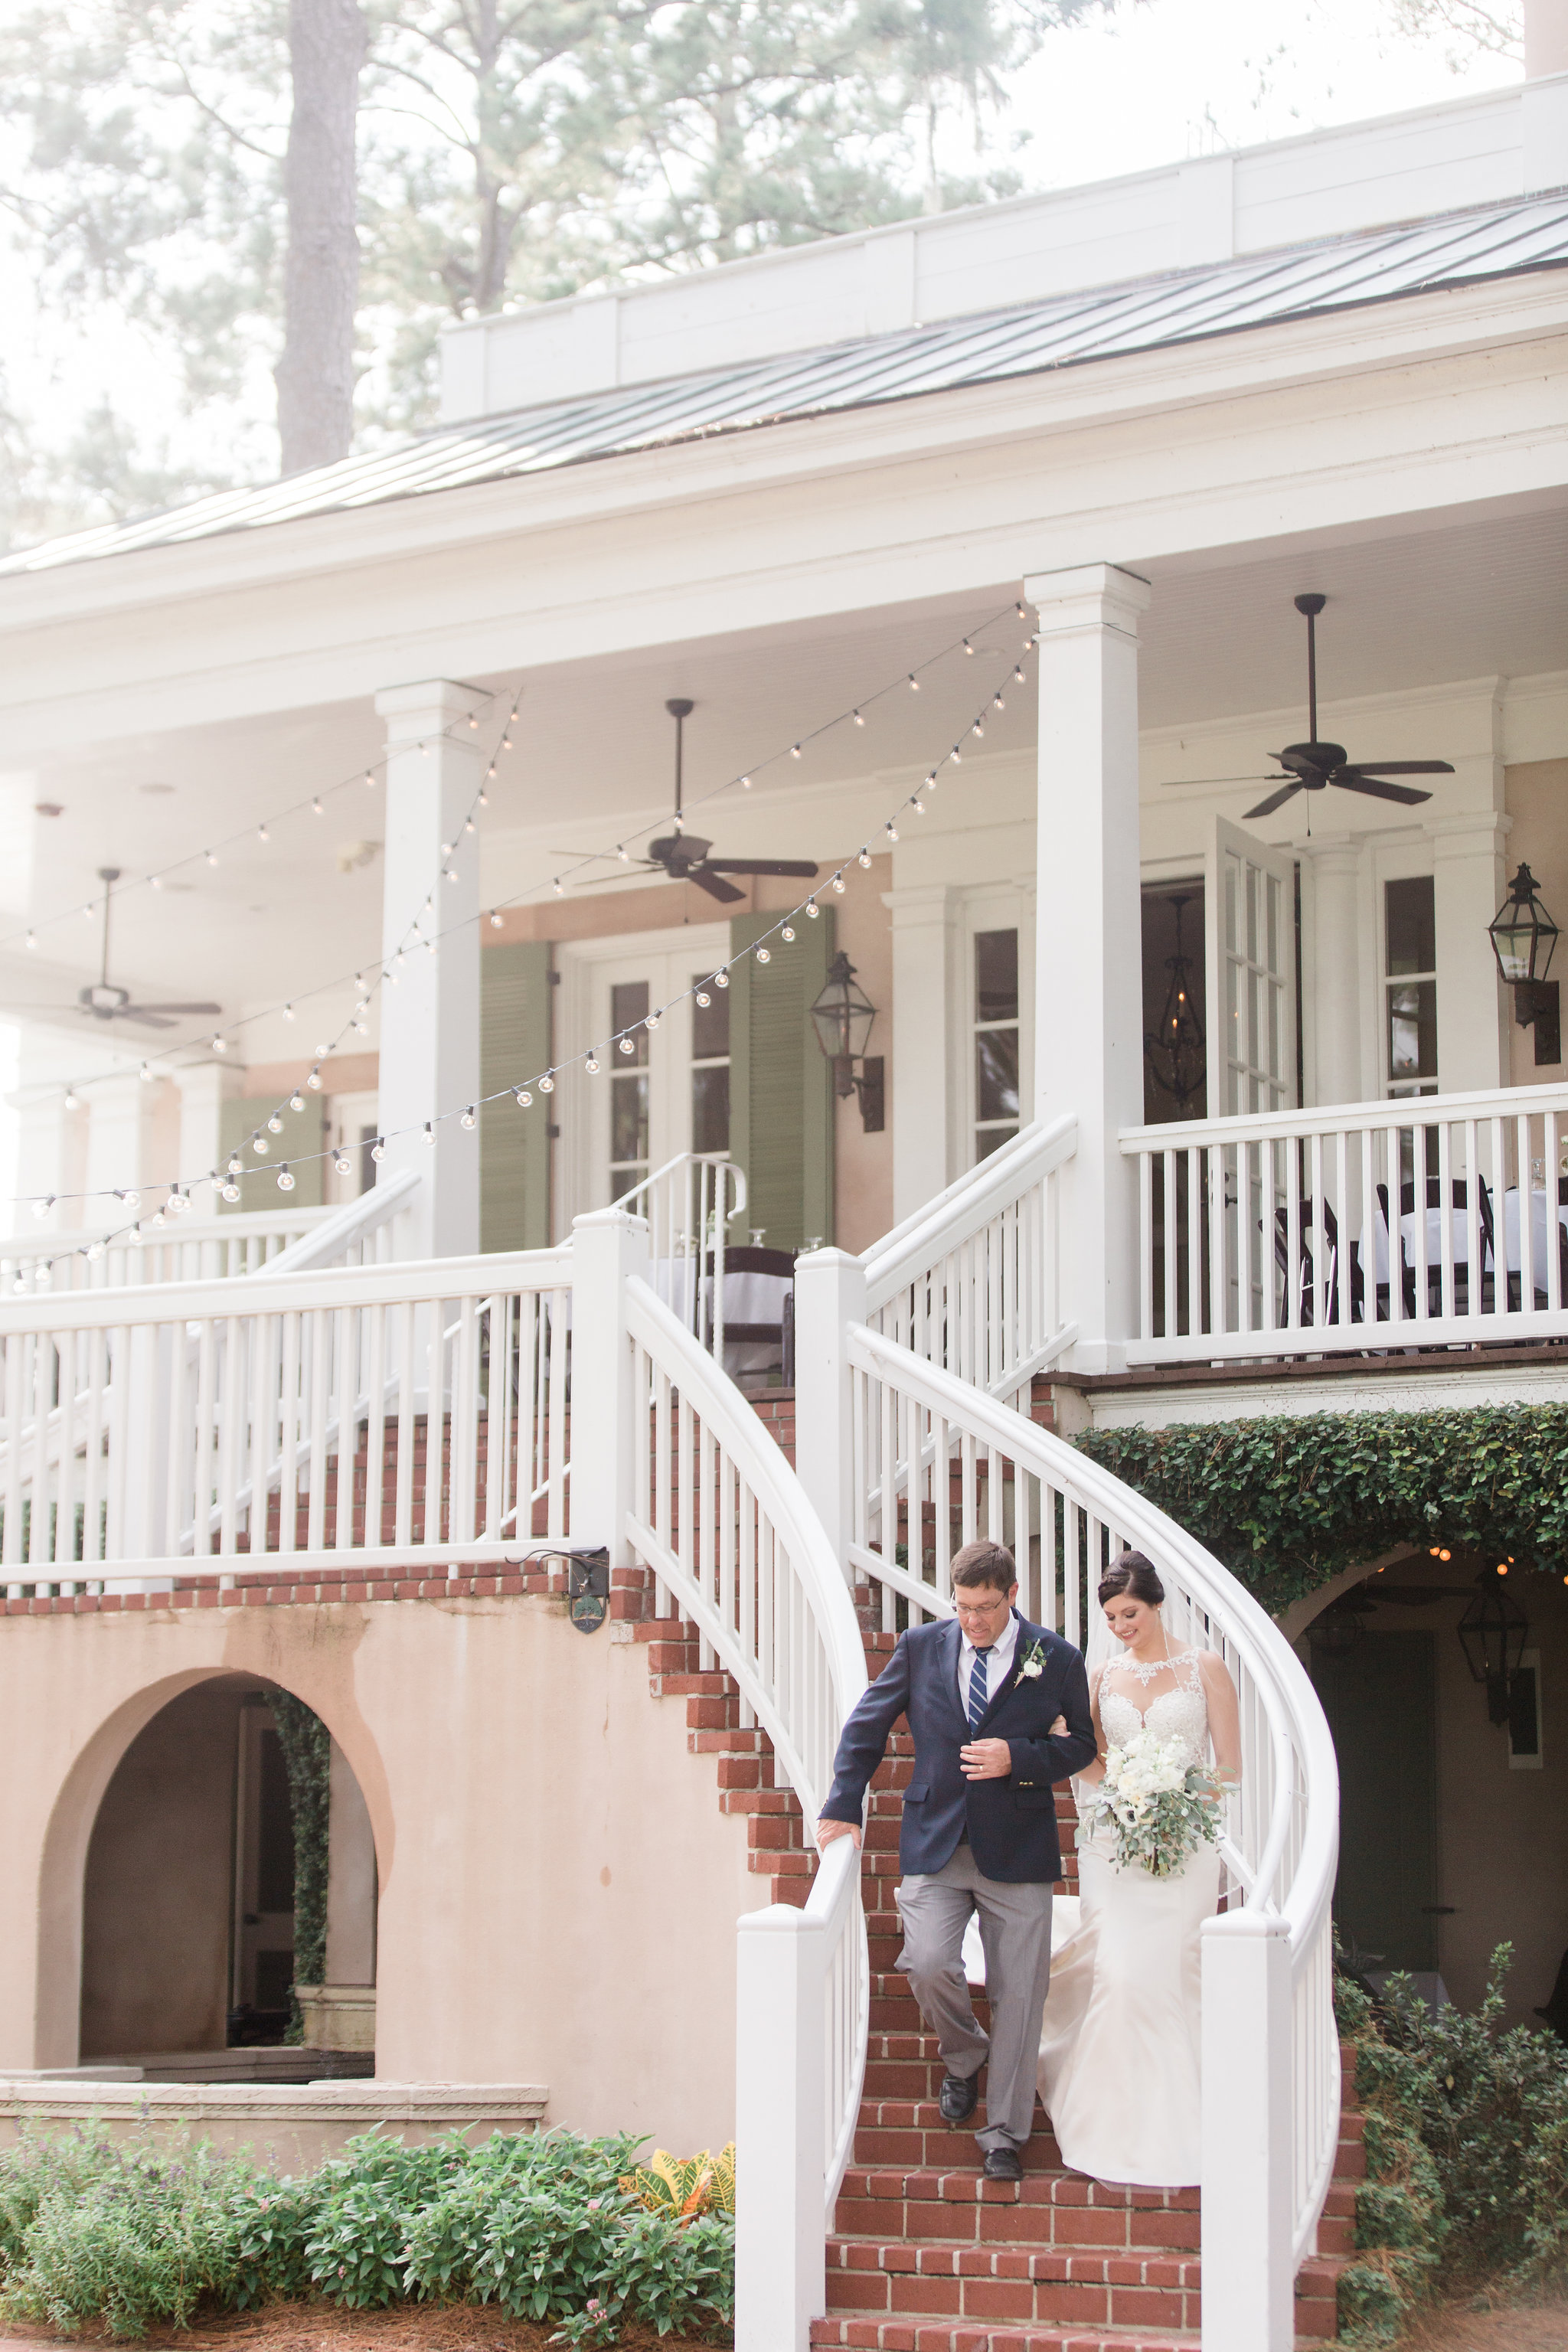 apt-b-photography-lauren-graham-oldfield-wedding-south-carolina-wedding-photographer-savannah-wedding-lowcountry-wedding-coastal-wedding-navy-wedding-plantation-wedding-25.JPG